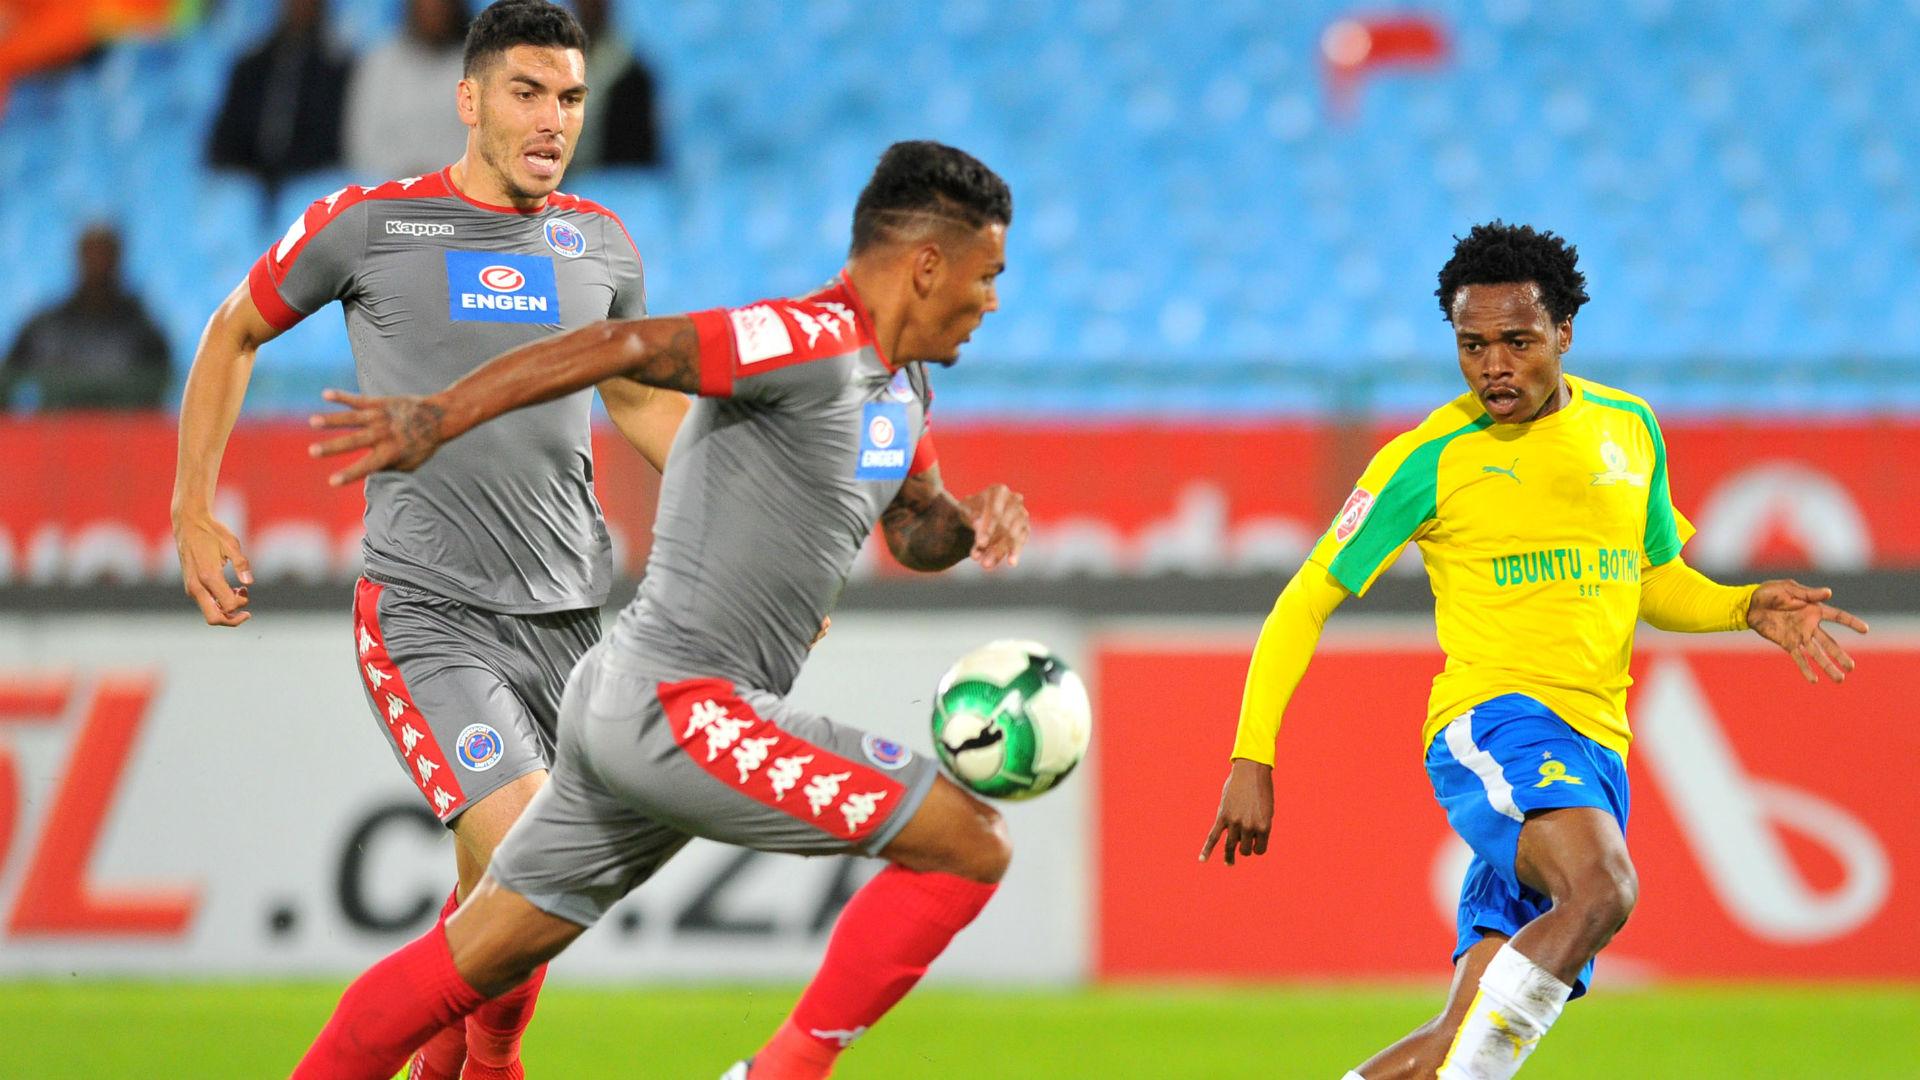 Clayton Daniels scores own goal from Tau cross - Sundowns v SuperSport United